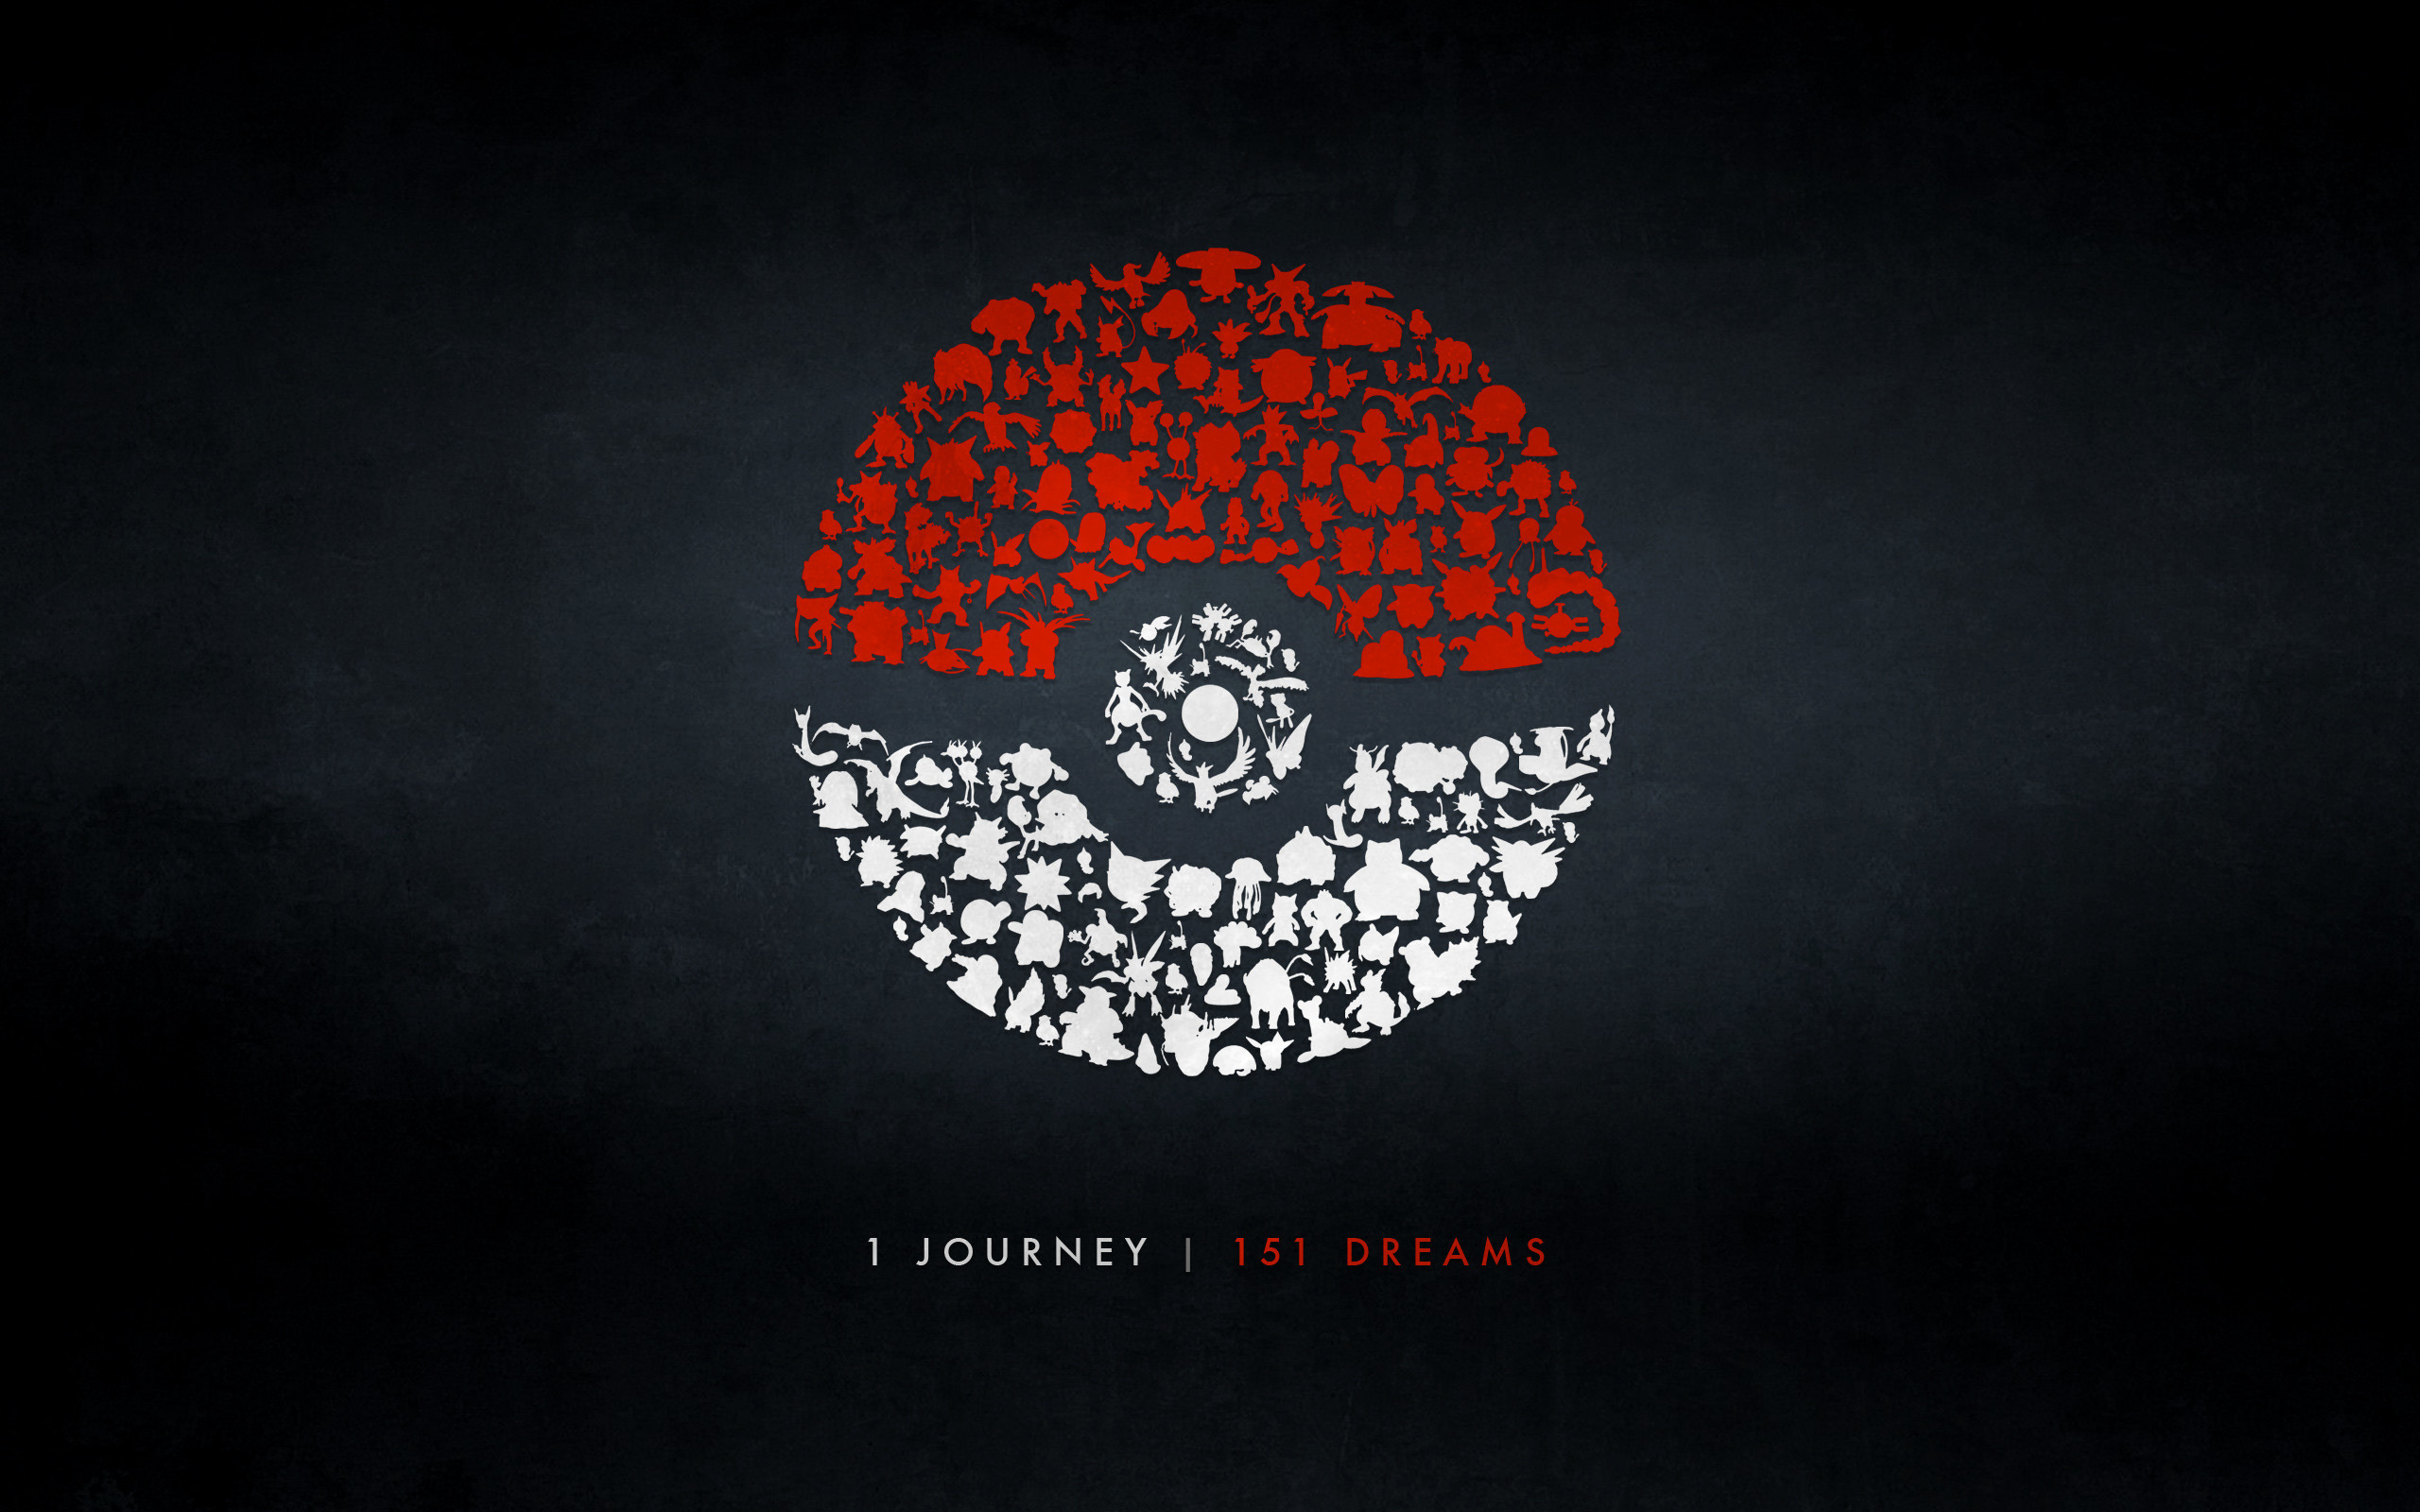 Pokemon Go HD